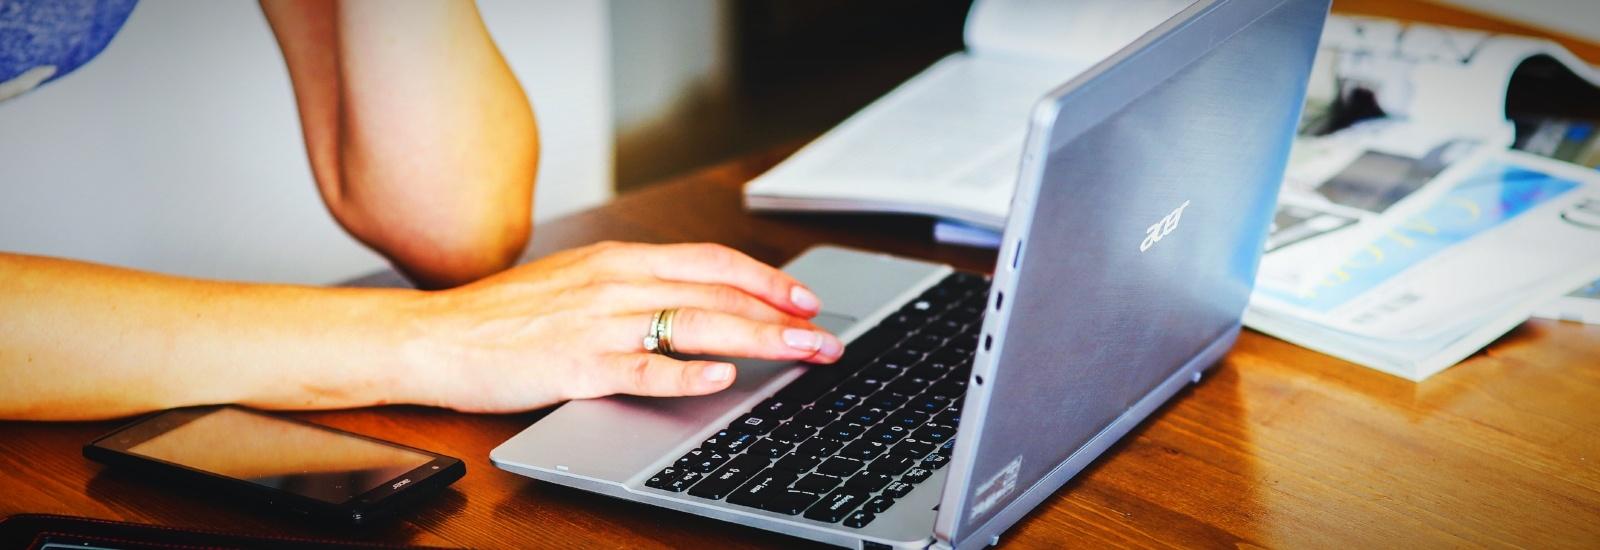 woman wedding ring computer (1)-112639-edited-2